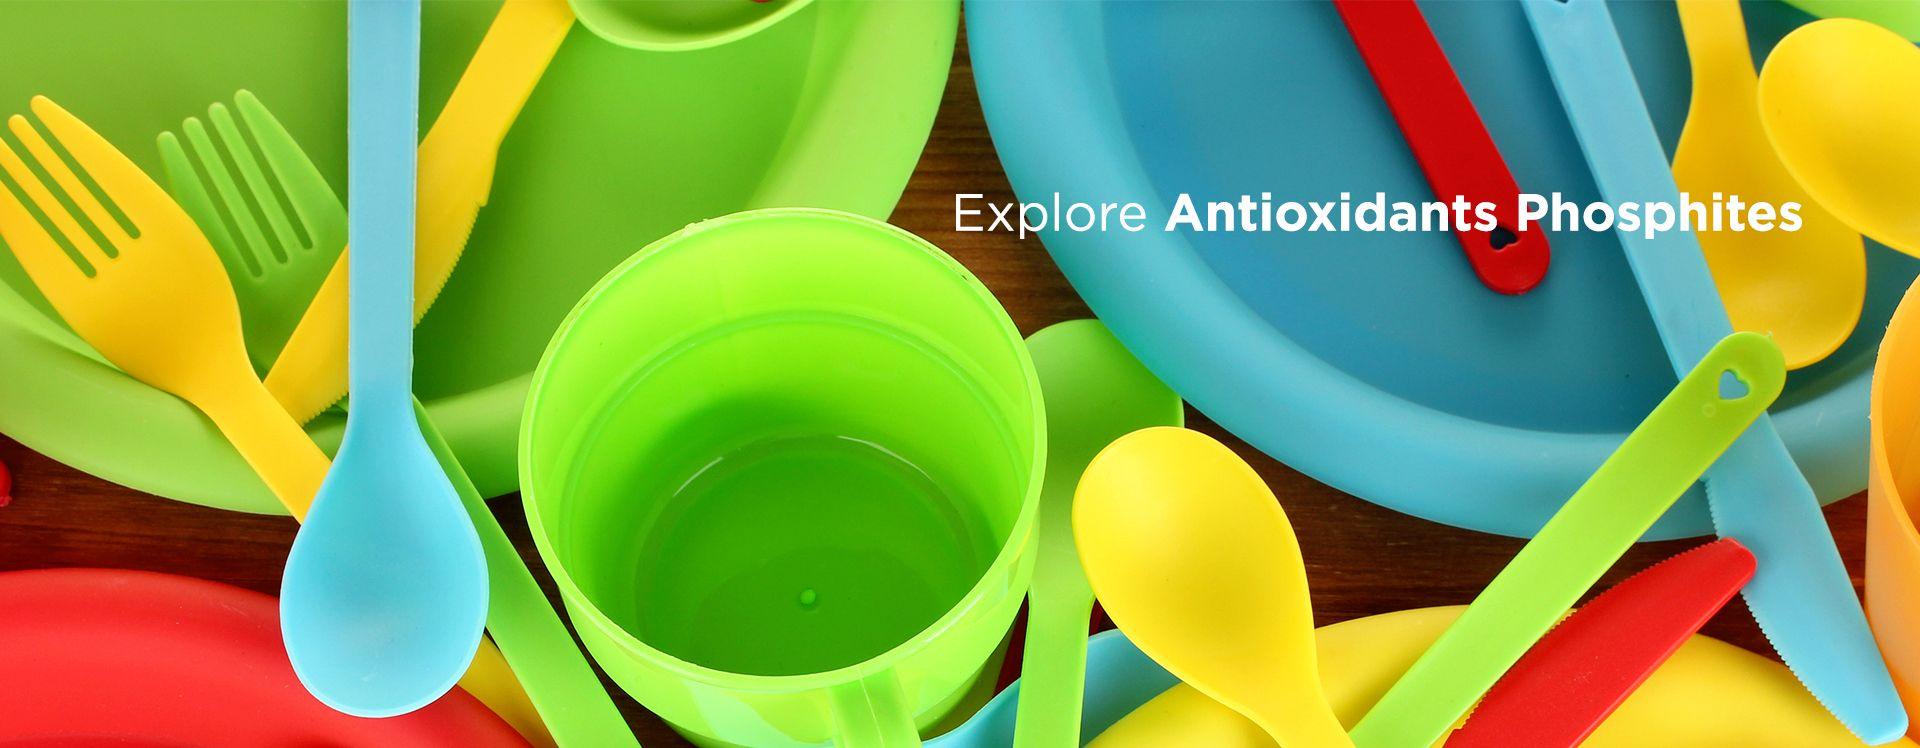 Antioxidants-Phosphites